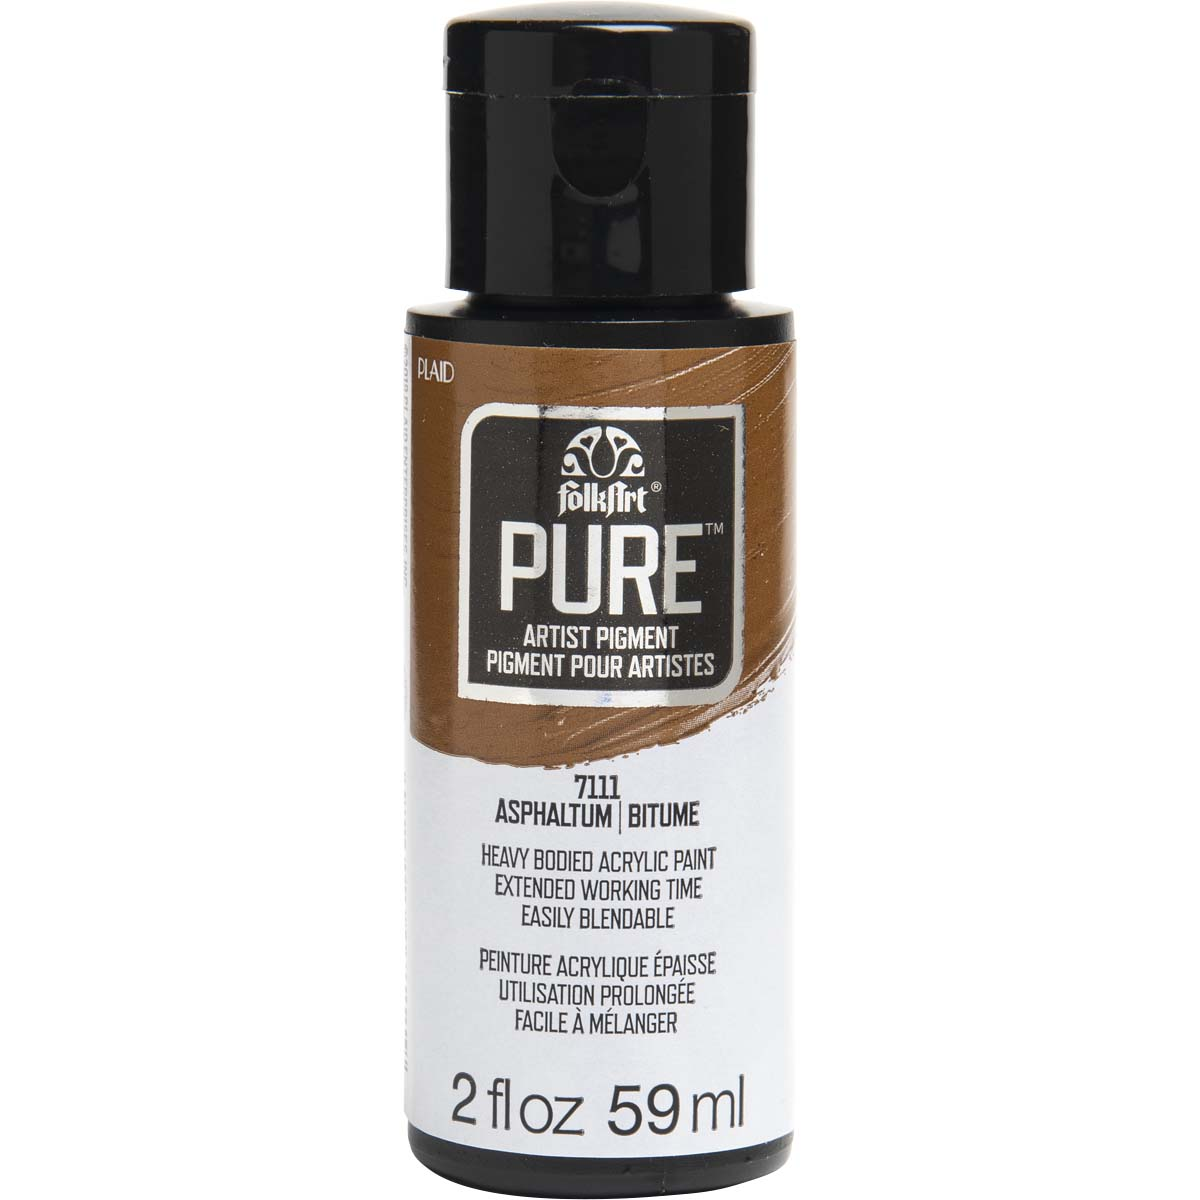 FolkArt ® Pure™ Artist Pigment - Asphaltum, 2 oz. - 7111